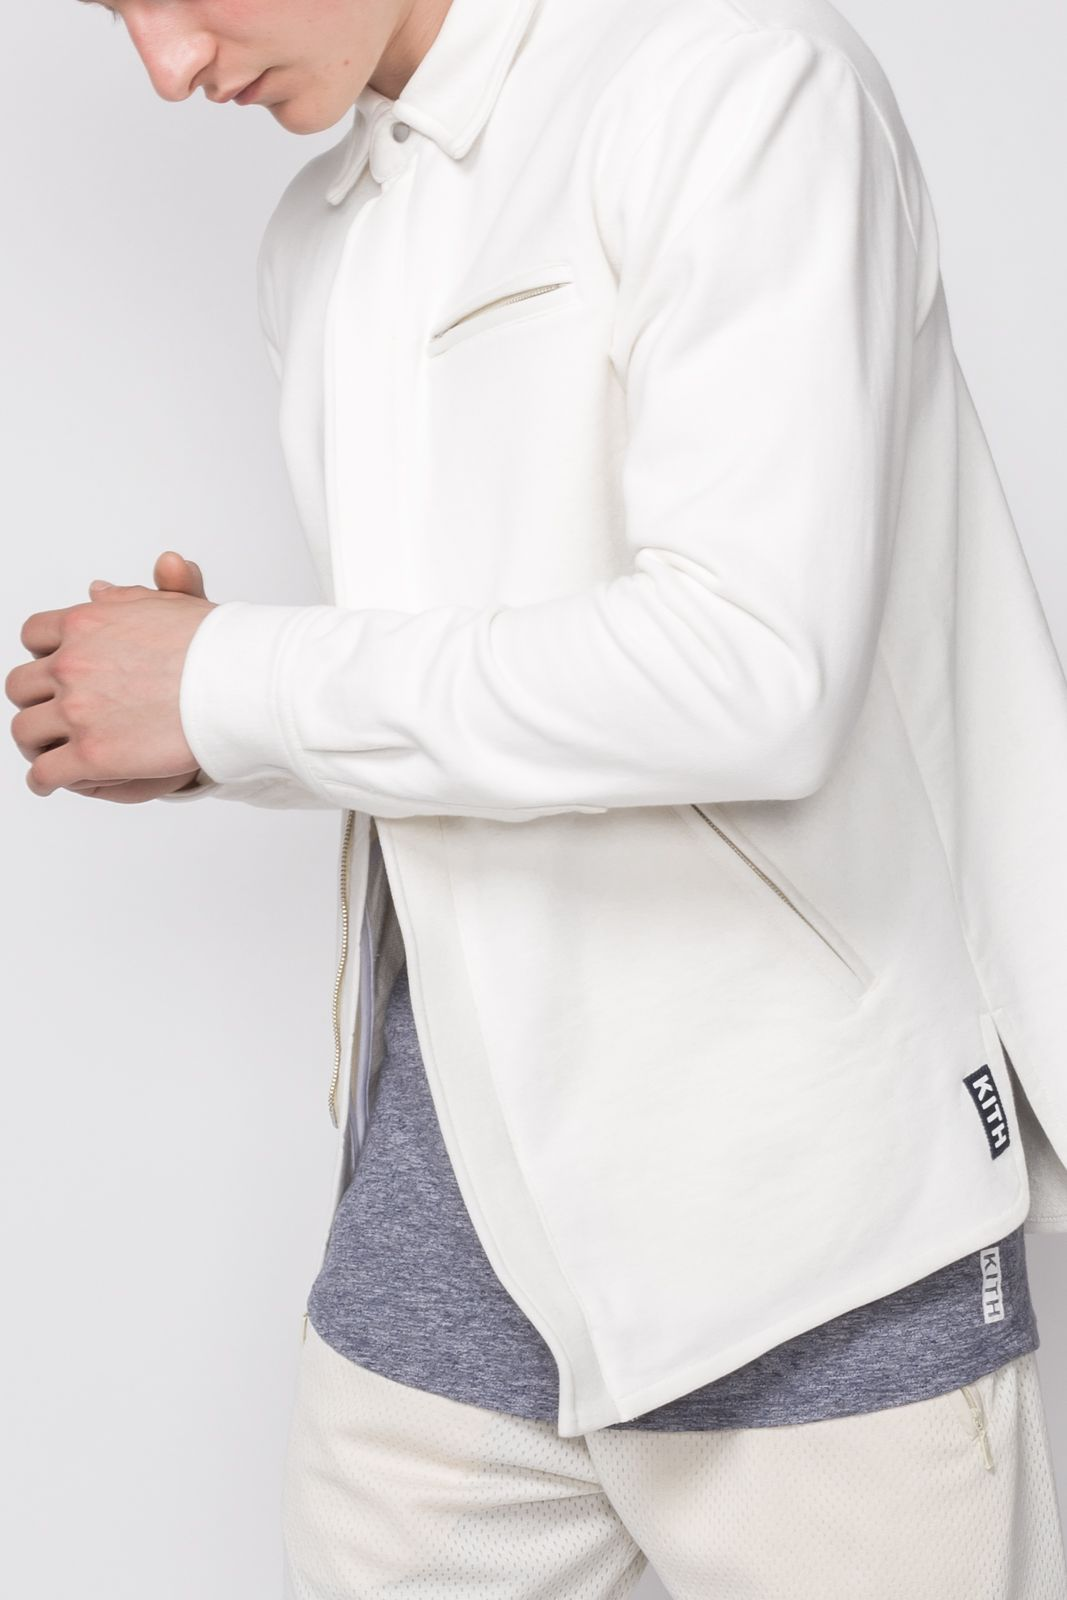 Kith spring uchome field advantageud menswear pinterest